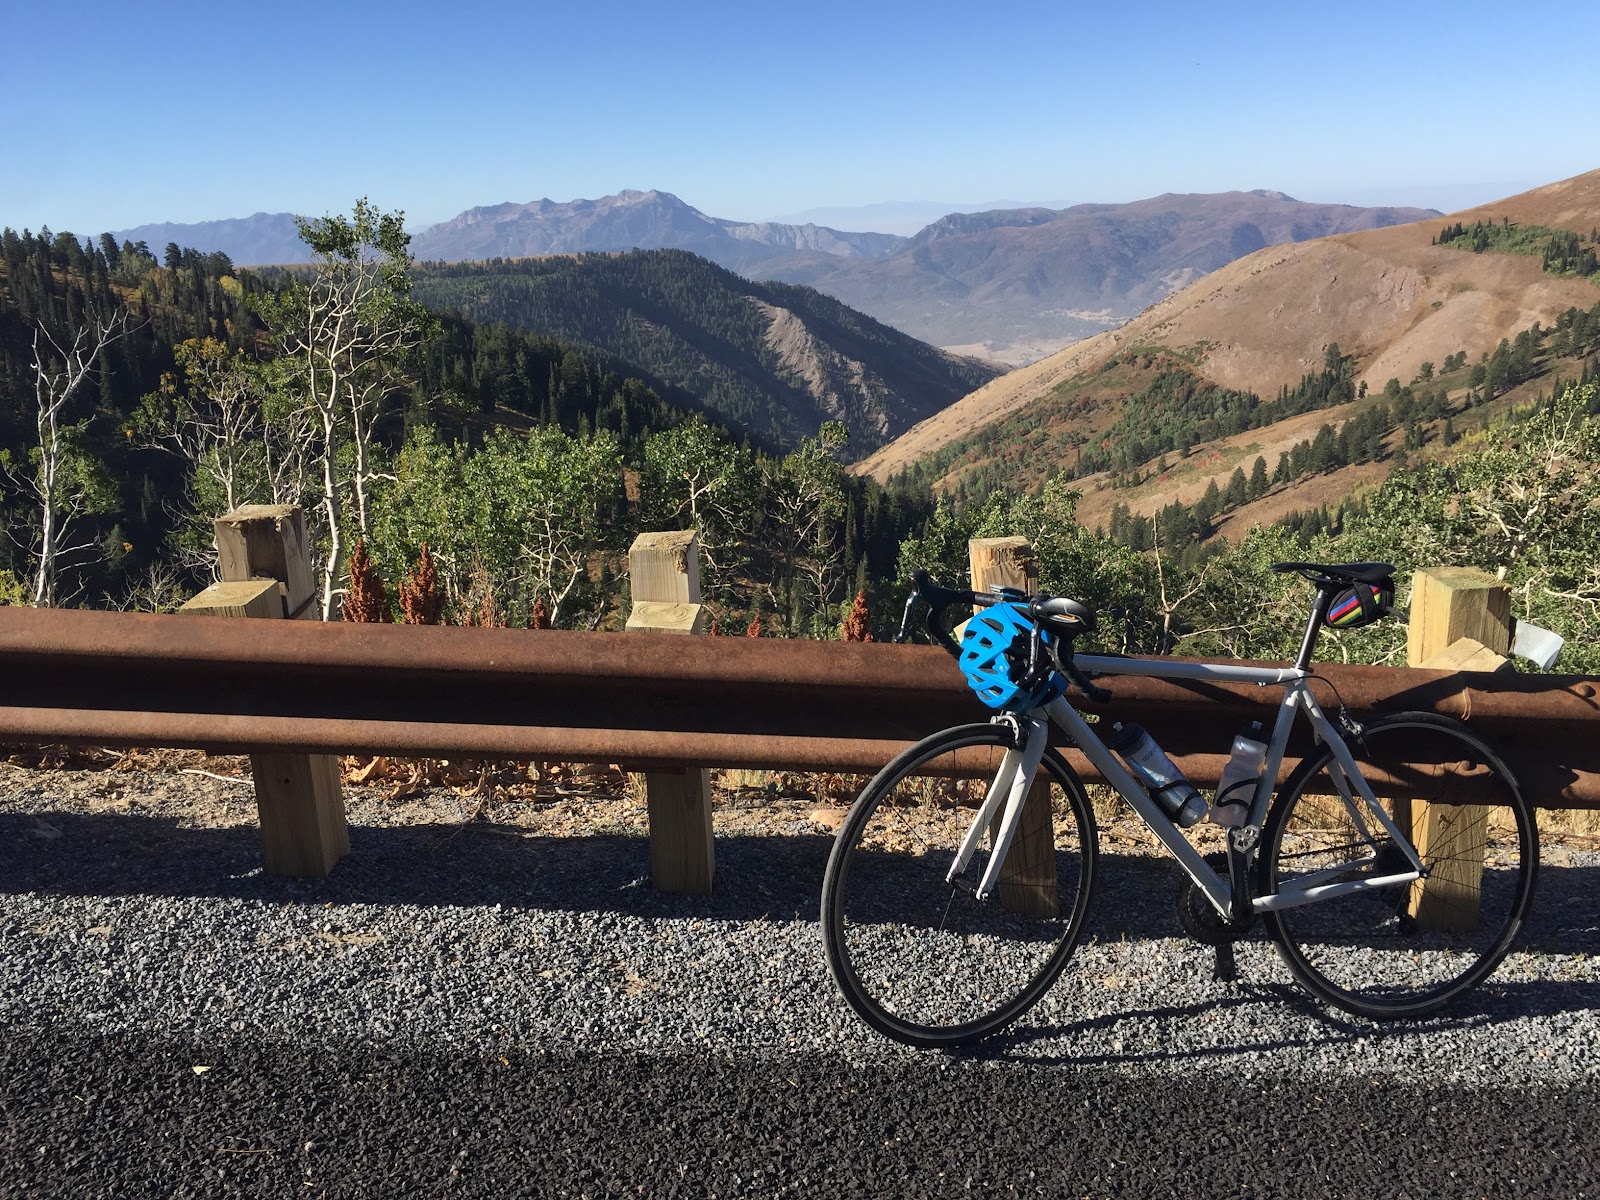 Bike at top of powder mountain climb by bike